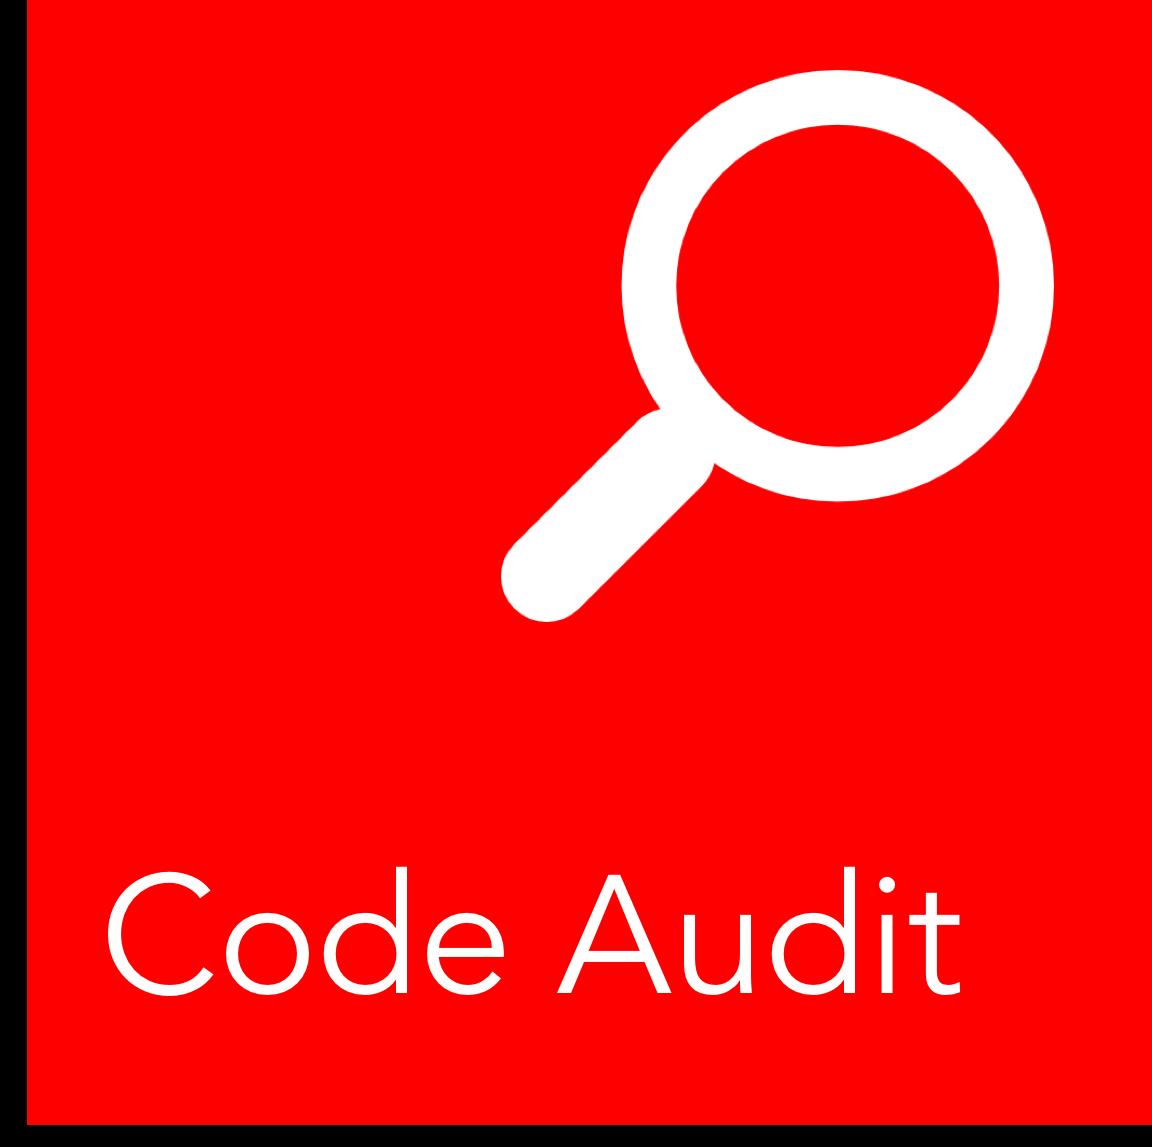 Code Audit.png